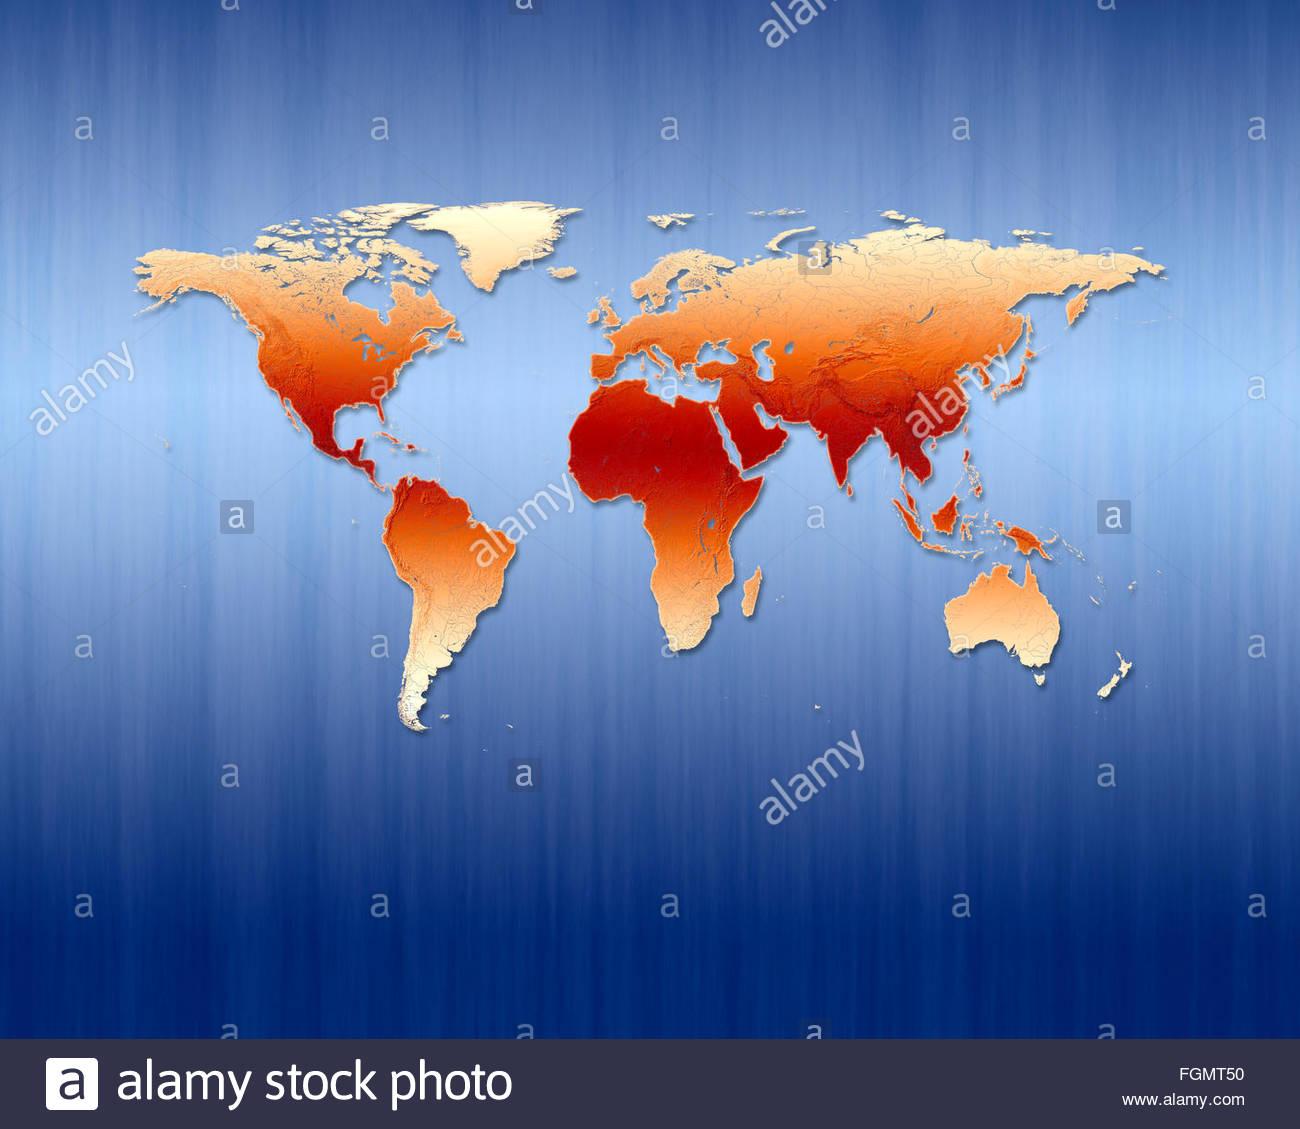 World map global globalization maps cartography worldwide geography continent futuristic international, earth - Stock Image